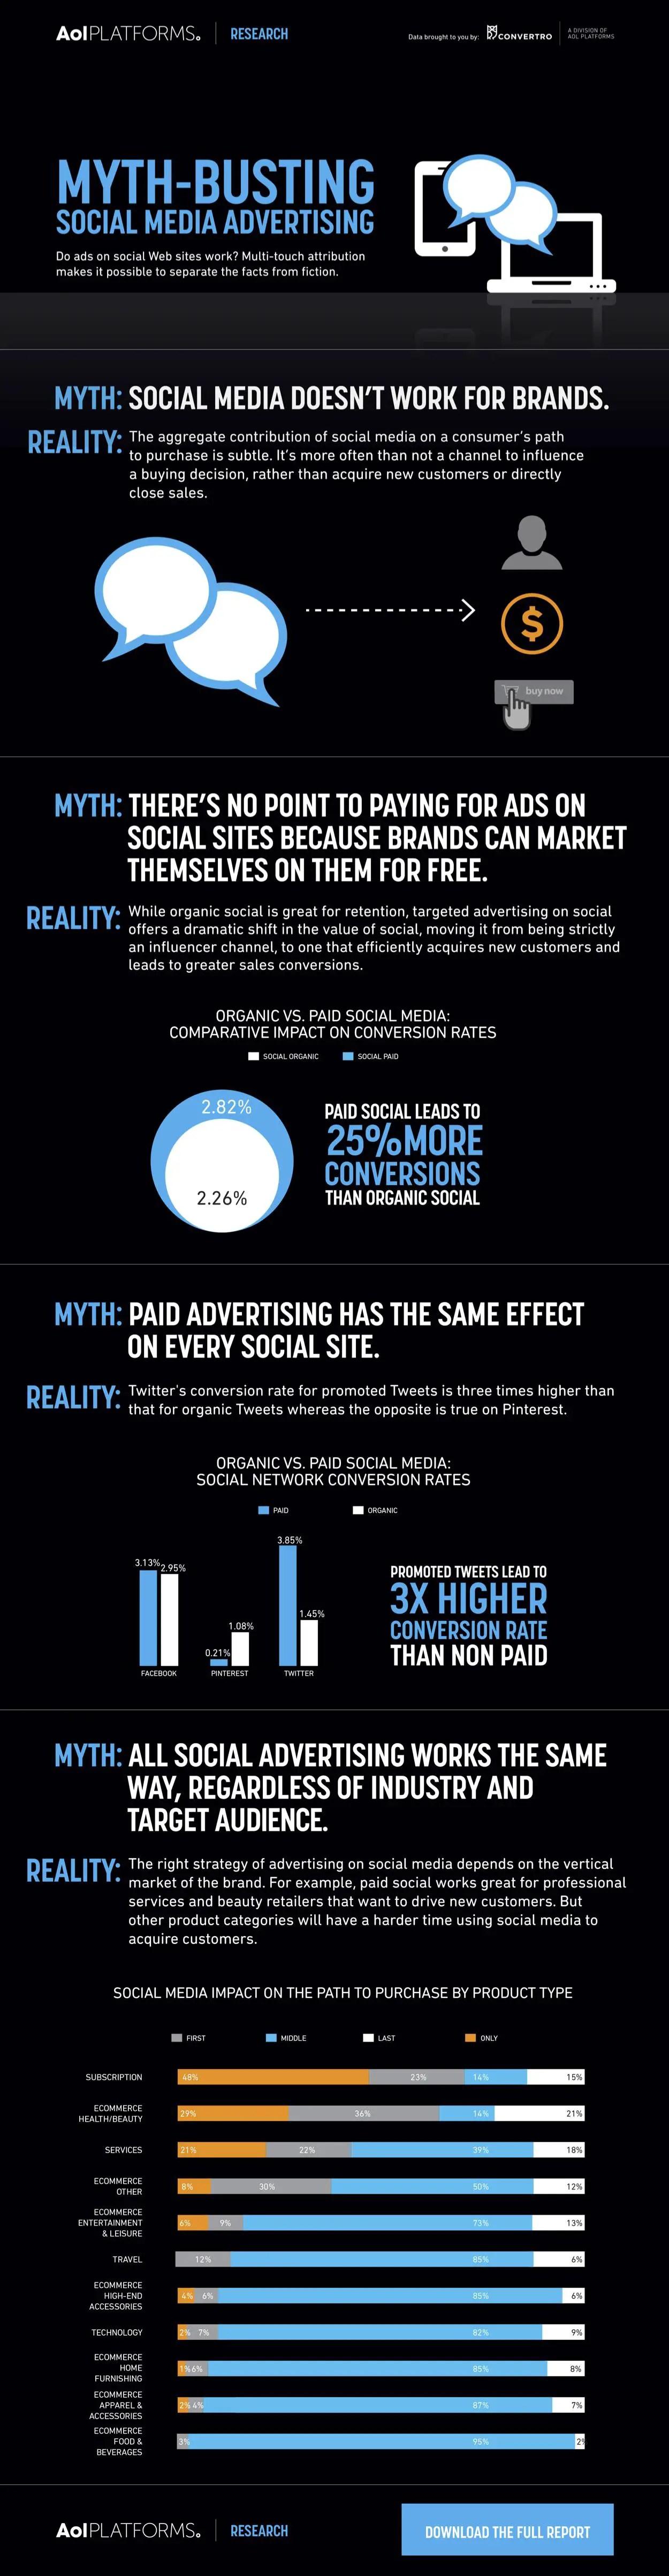 convertro_socialmedia_infographic_Final1-2